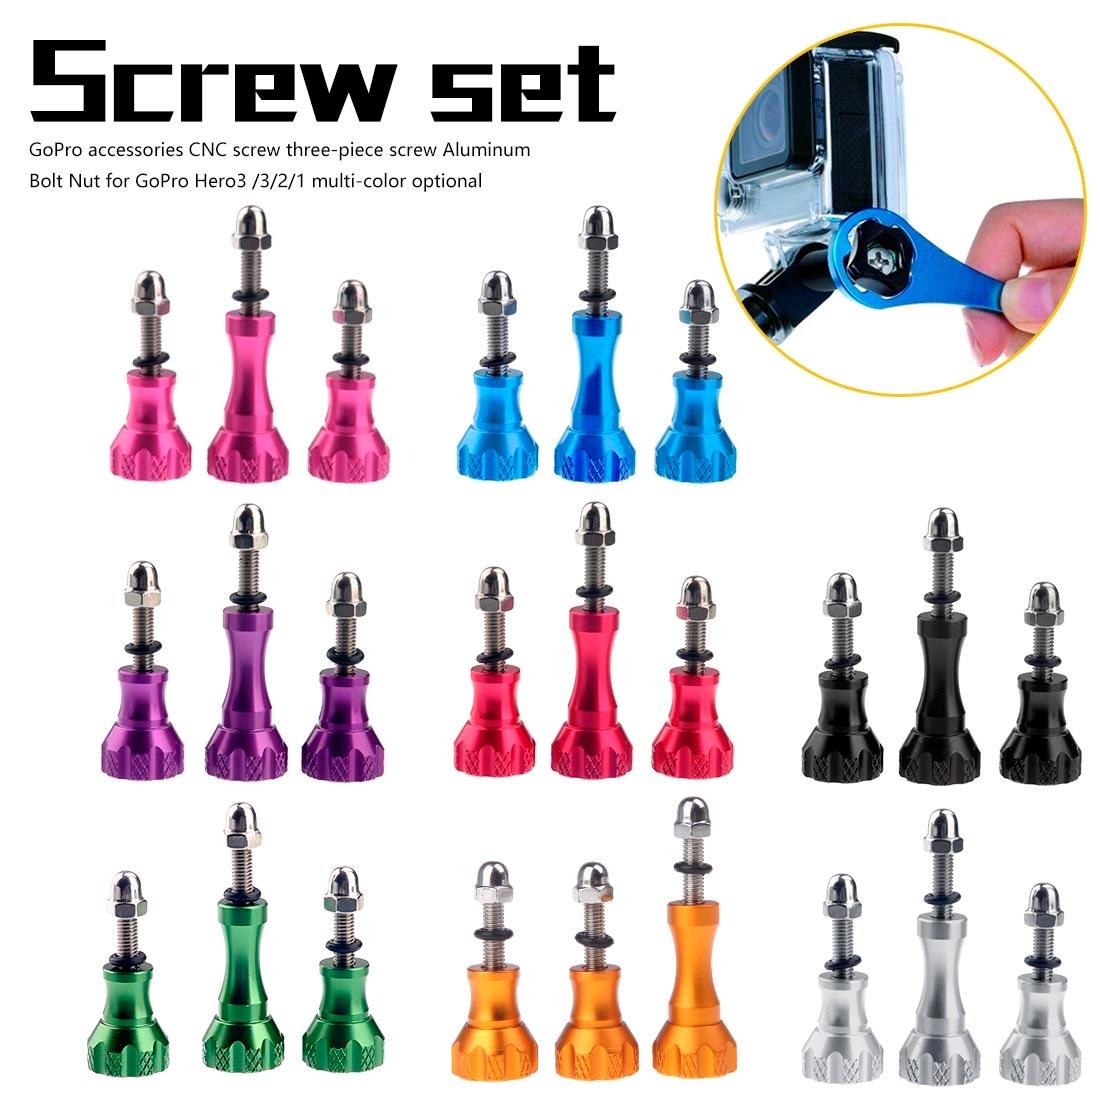 3 pcs for GoPro Hero3 /3/2/1 multi-color optional accessories CNC screw three-piece screw Aluminum Bolt Nut(China)